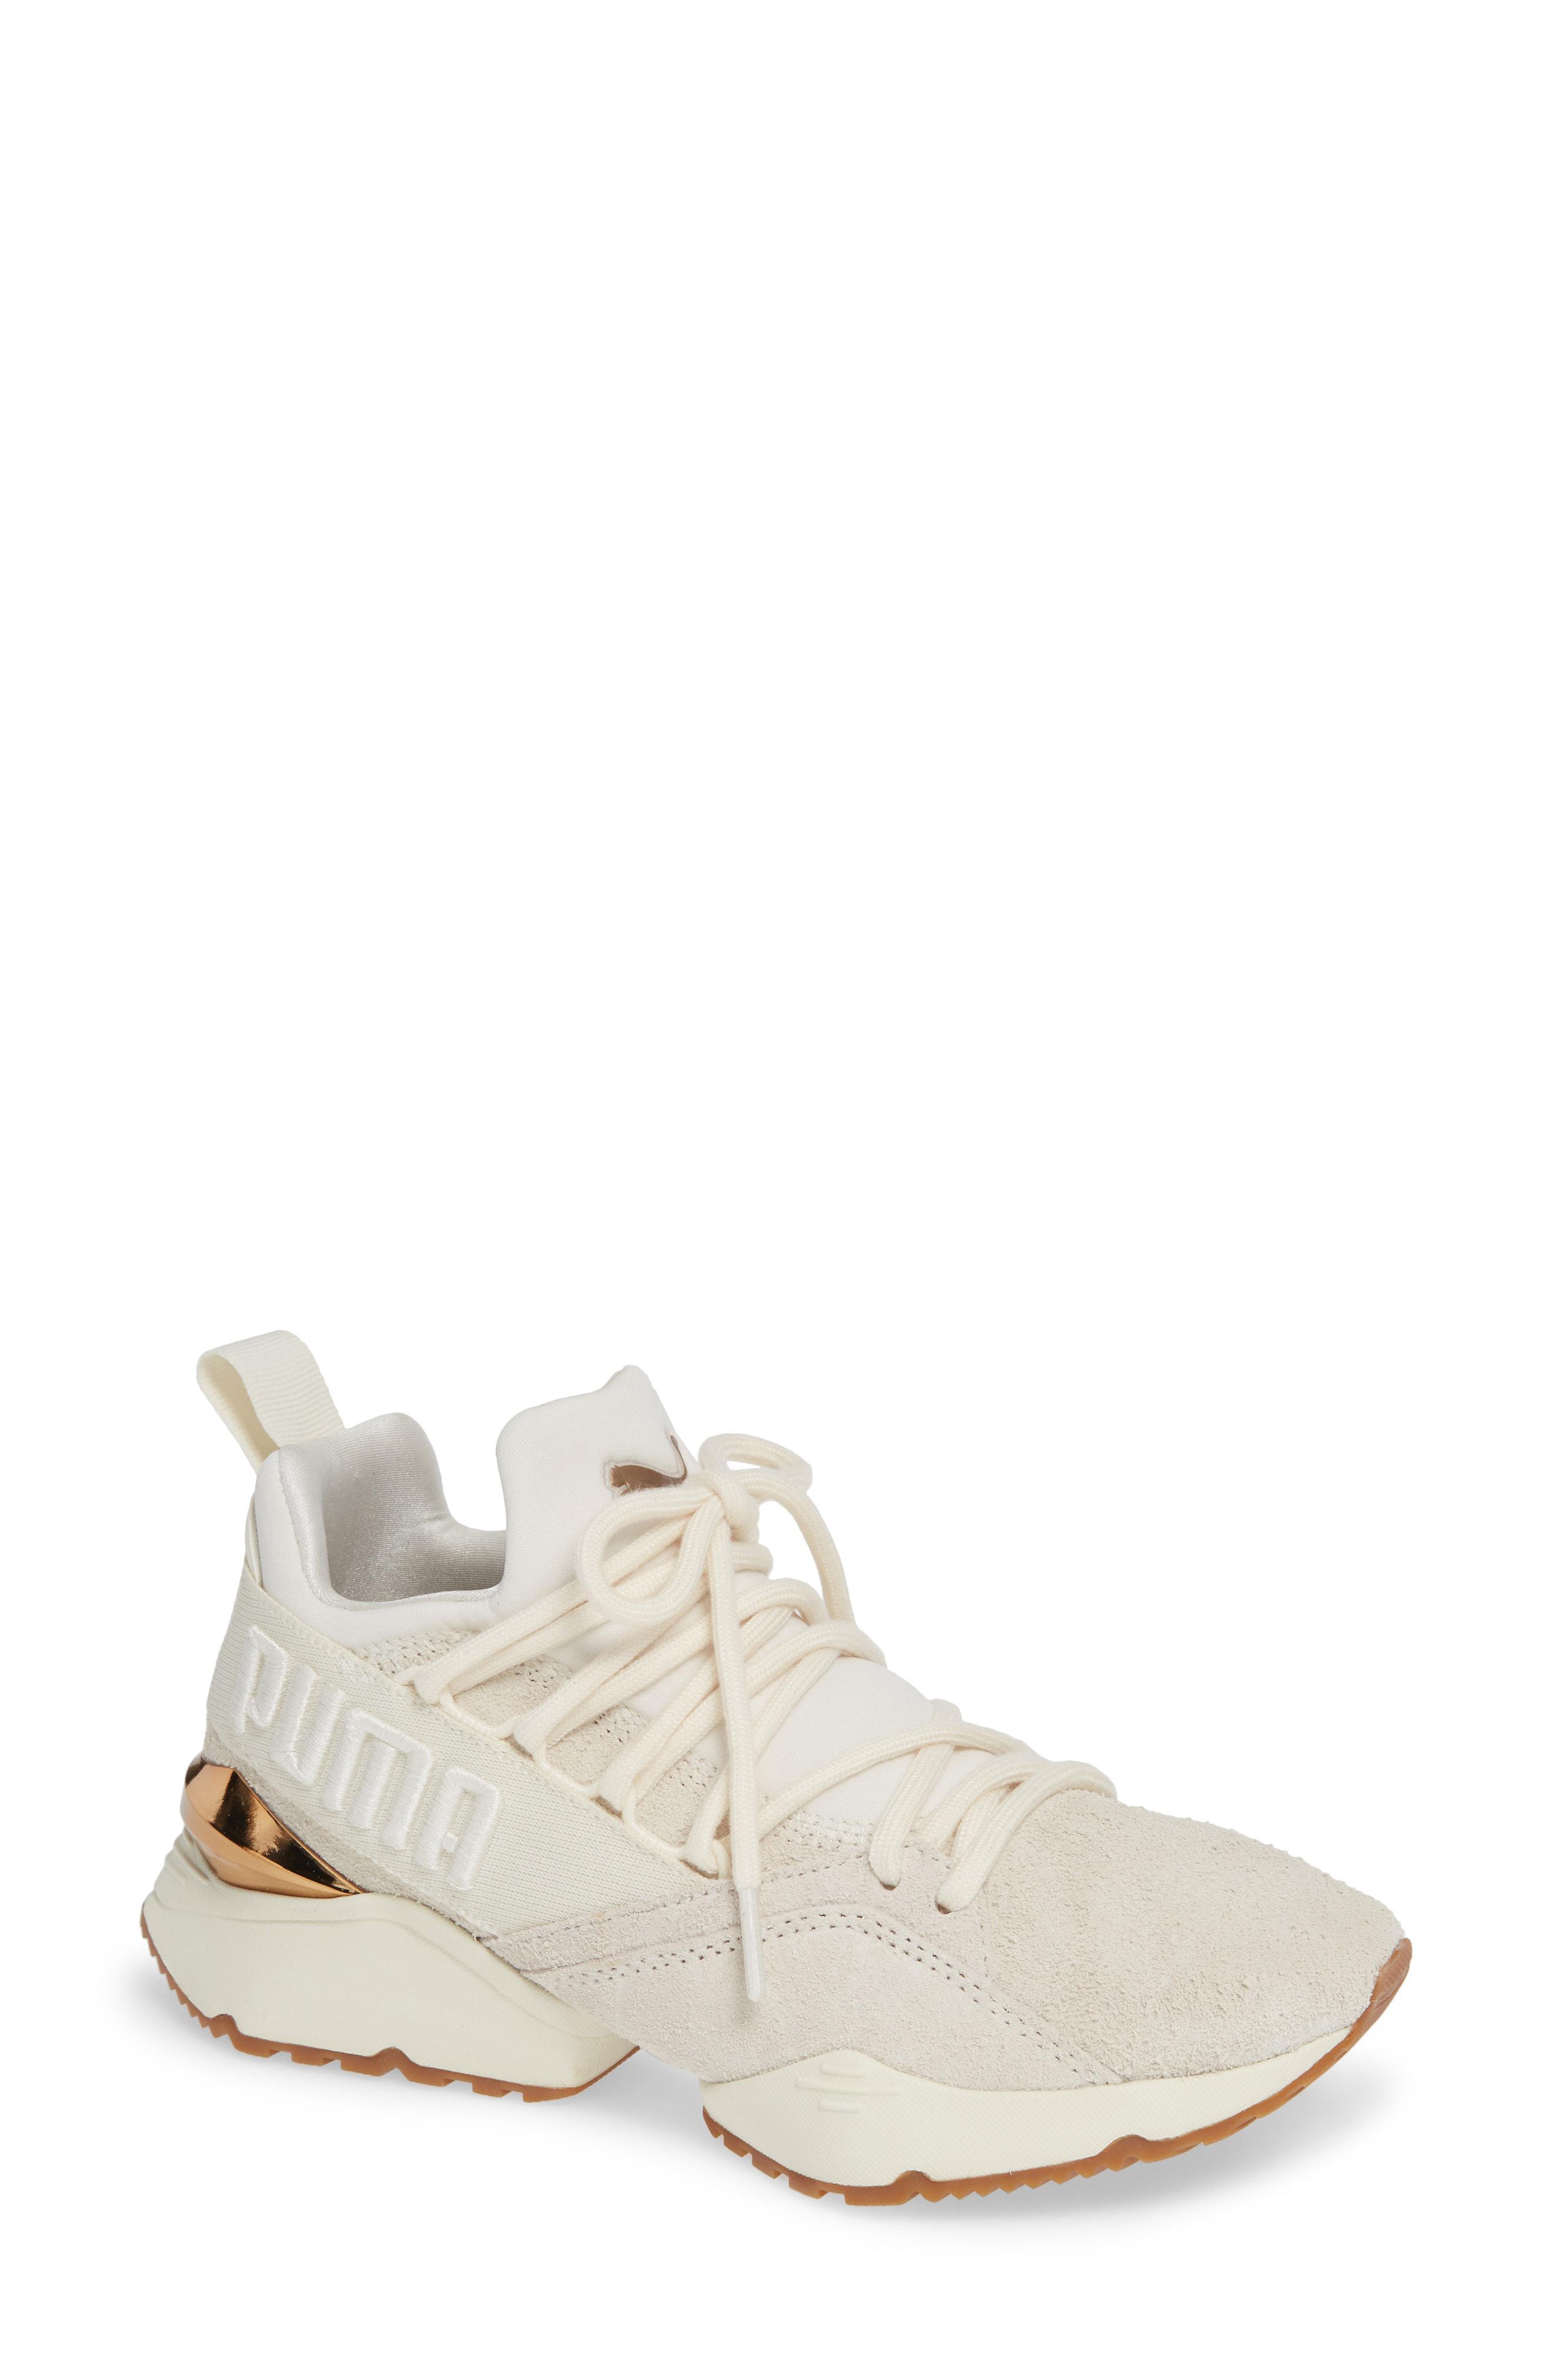 Lyst - PUMA Muse Maia Utility Sneaker in White ea29cf996